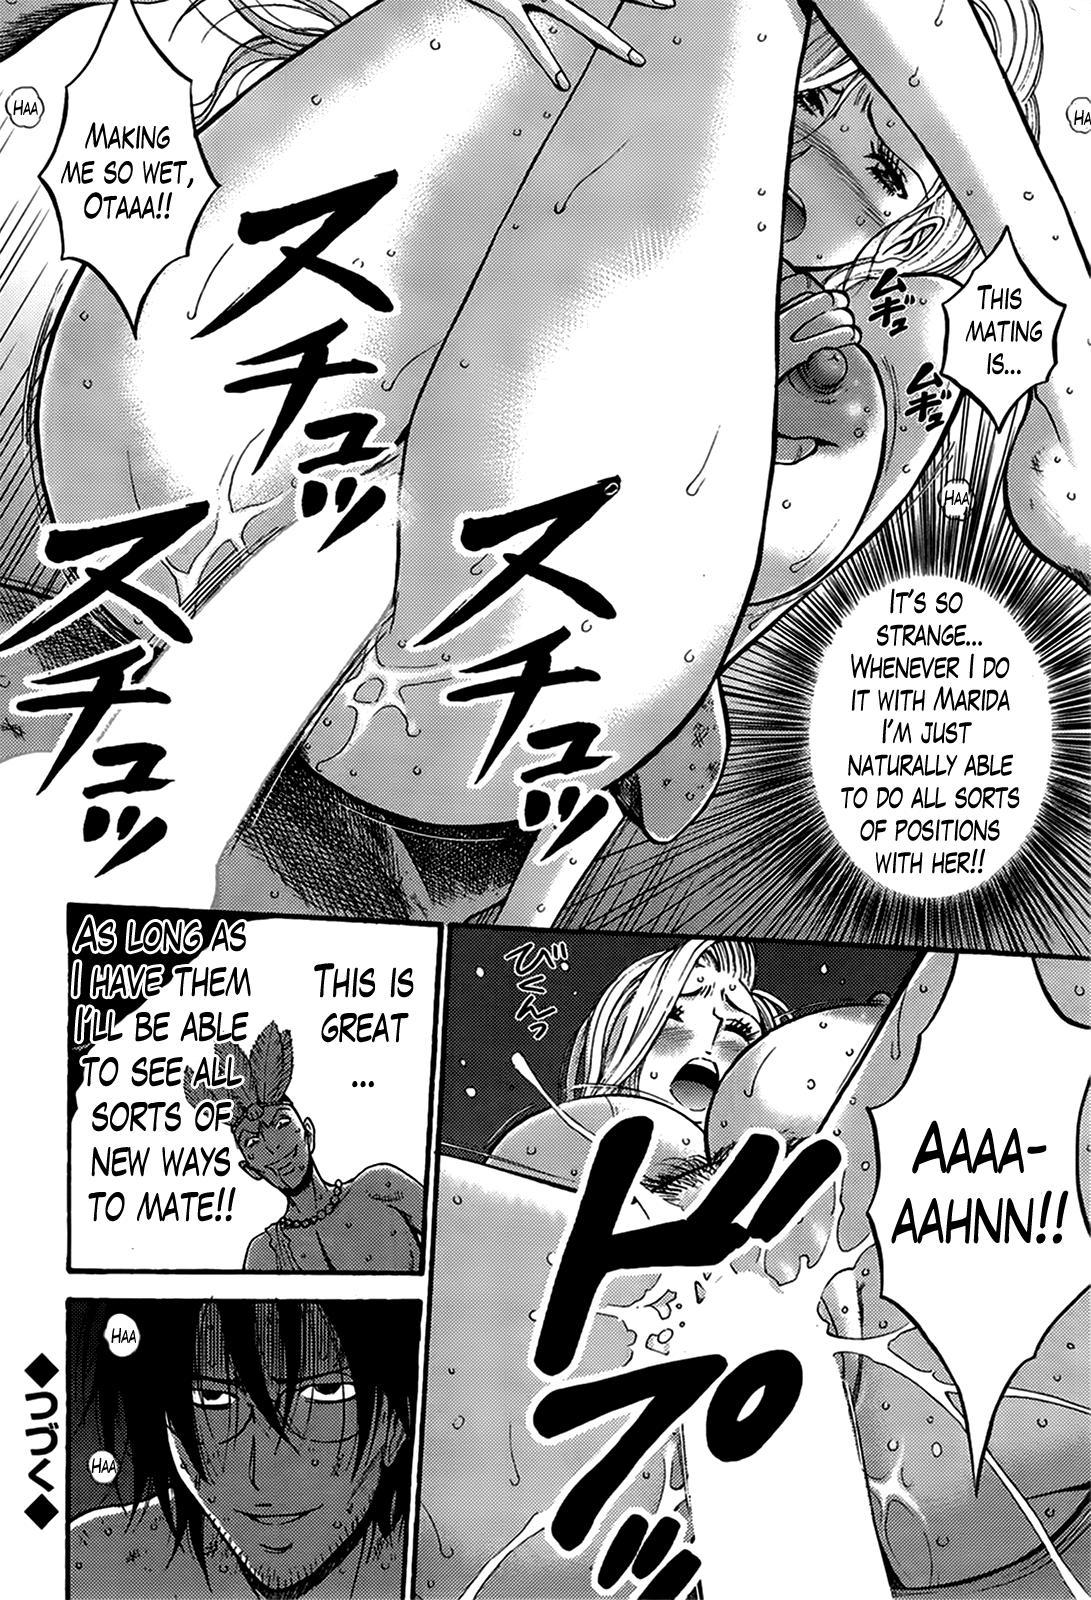 Kigenzen 10000 Nen no Ota | The Otaku in 10,000 B.C. 232